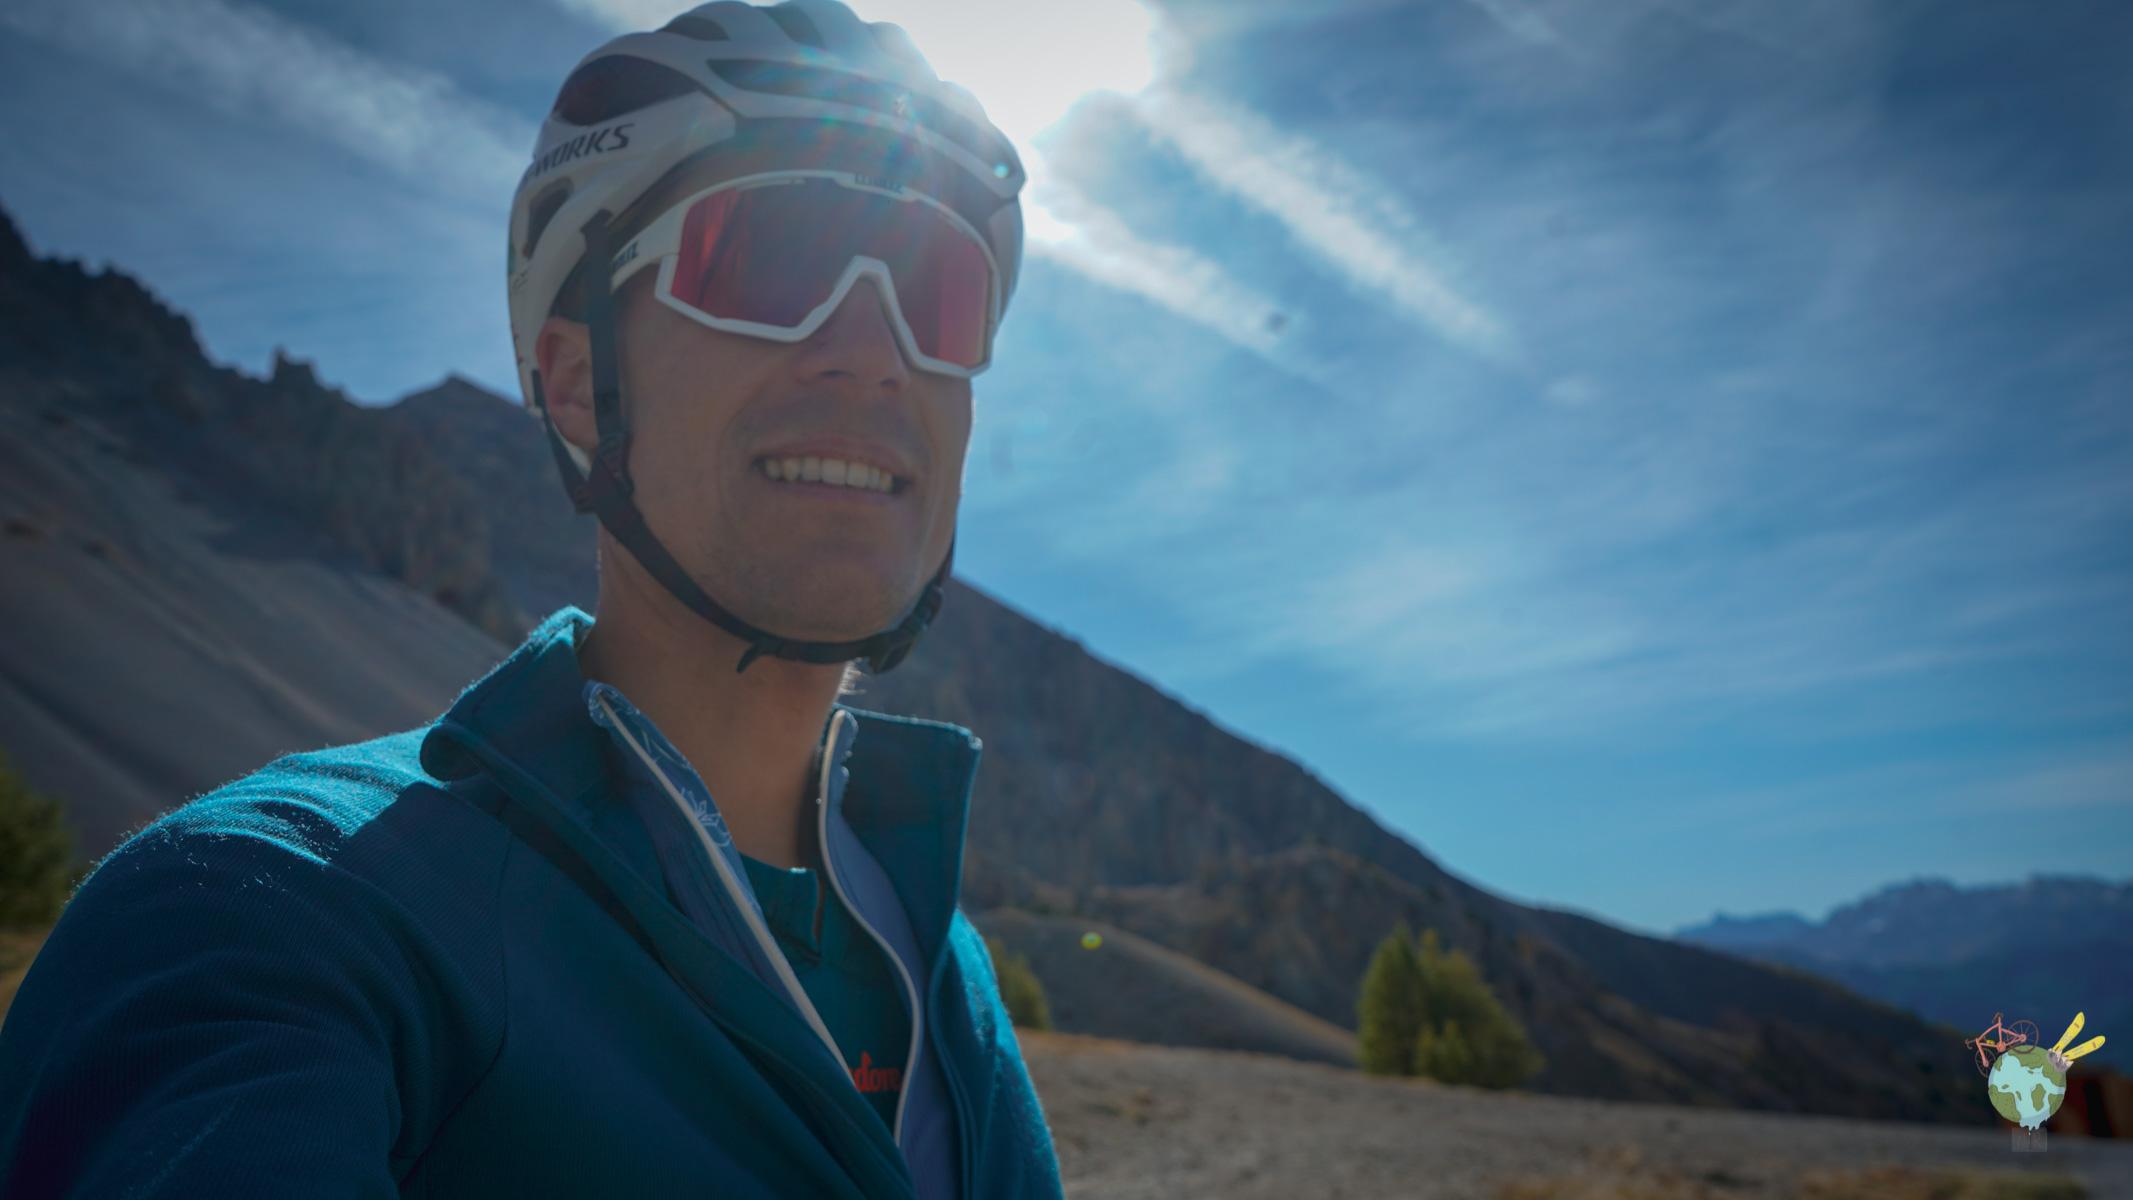 Nicolas Raybaud lunette Bliz Col d'Izoard